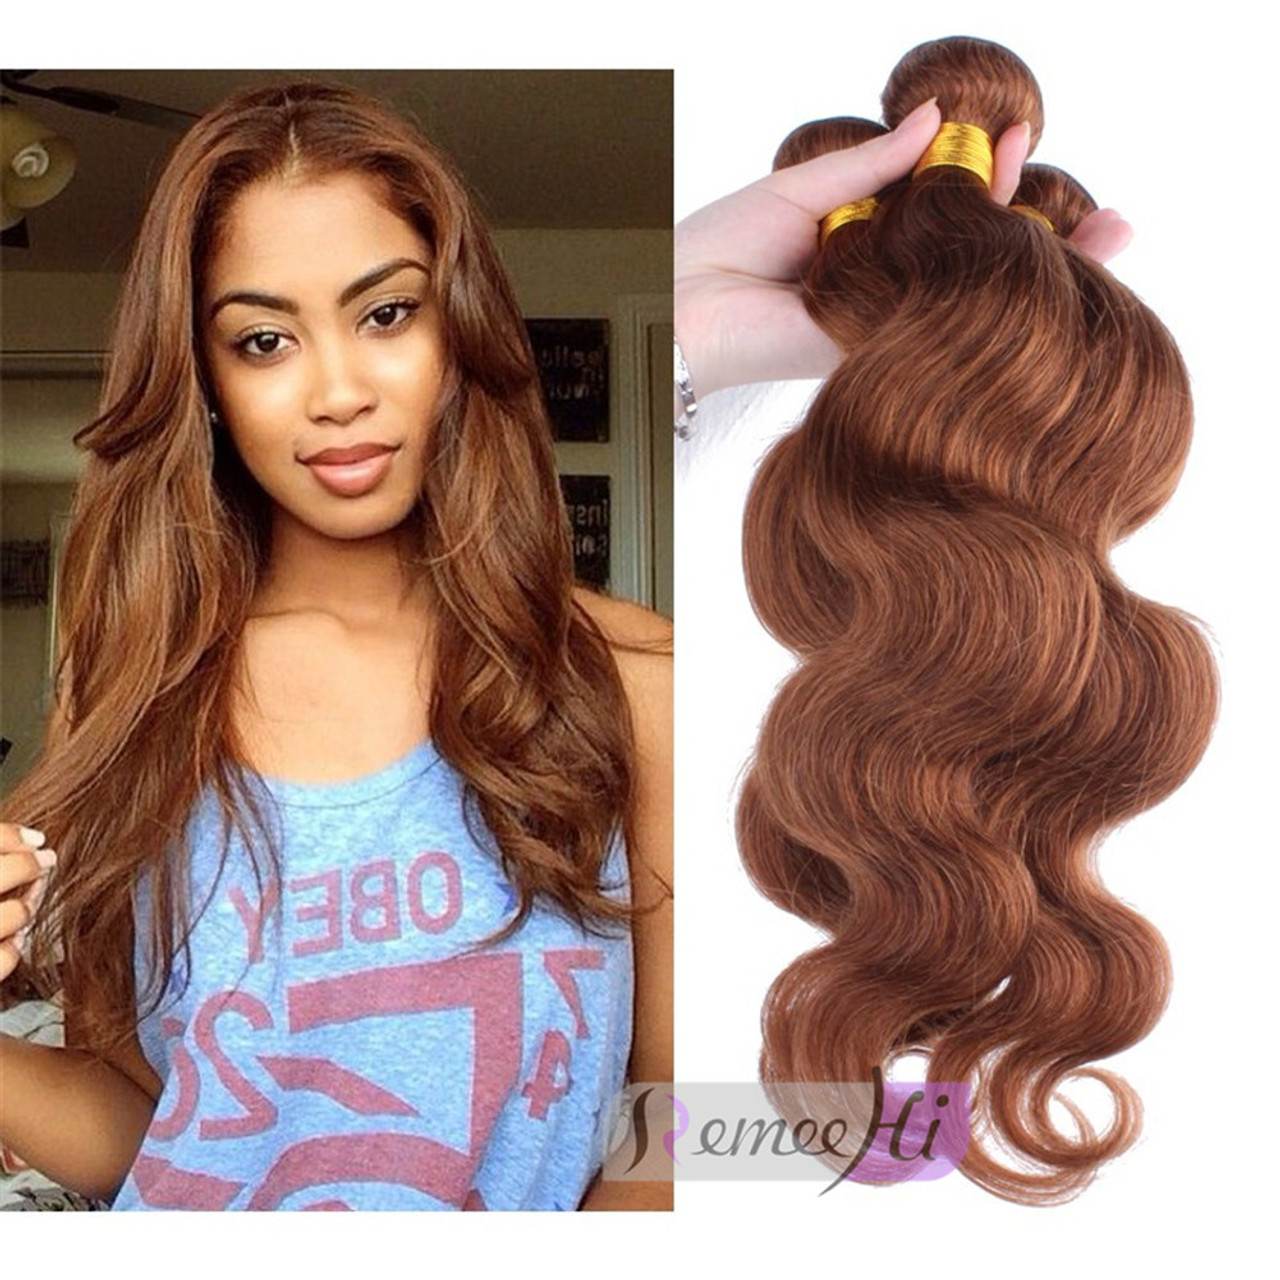 Remeehi Body Wave 30 Honey Brown Hair Weft Human Hair Extensions Peruvian Virgin Hair